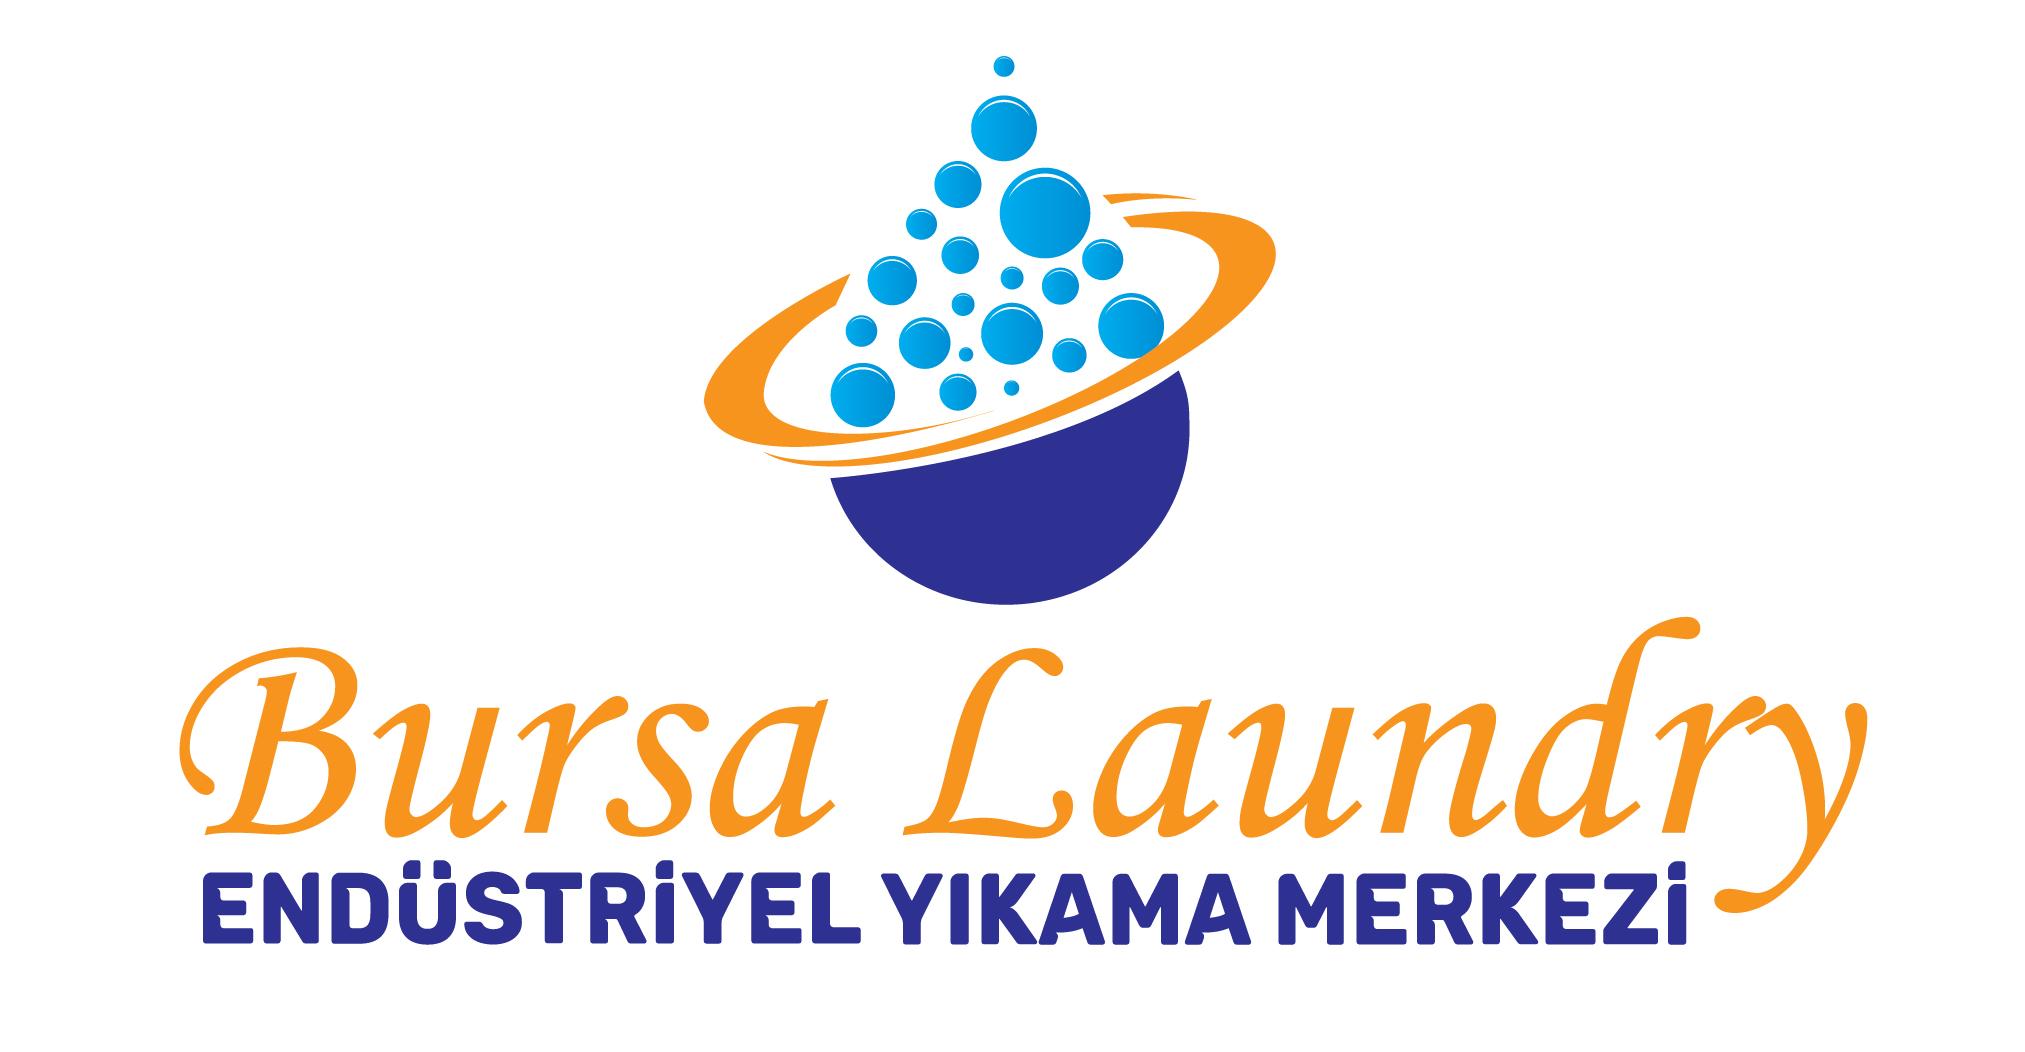 Bursa Laundry